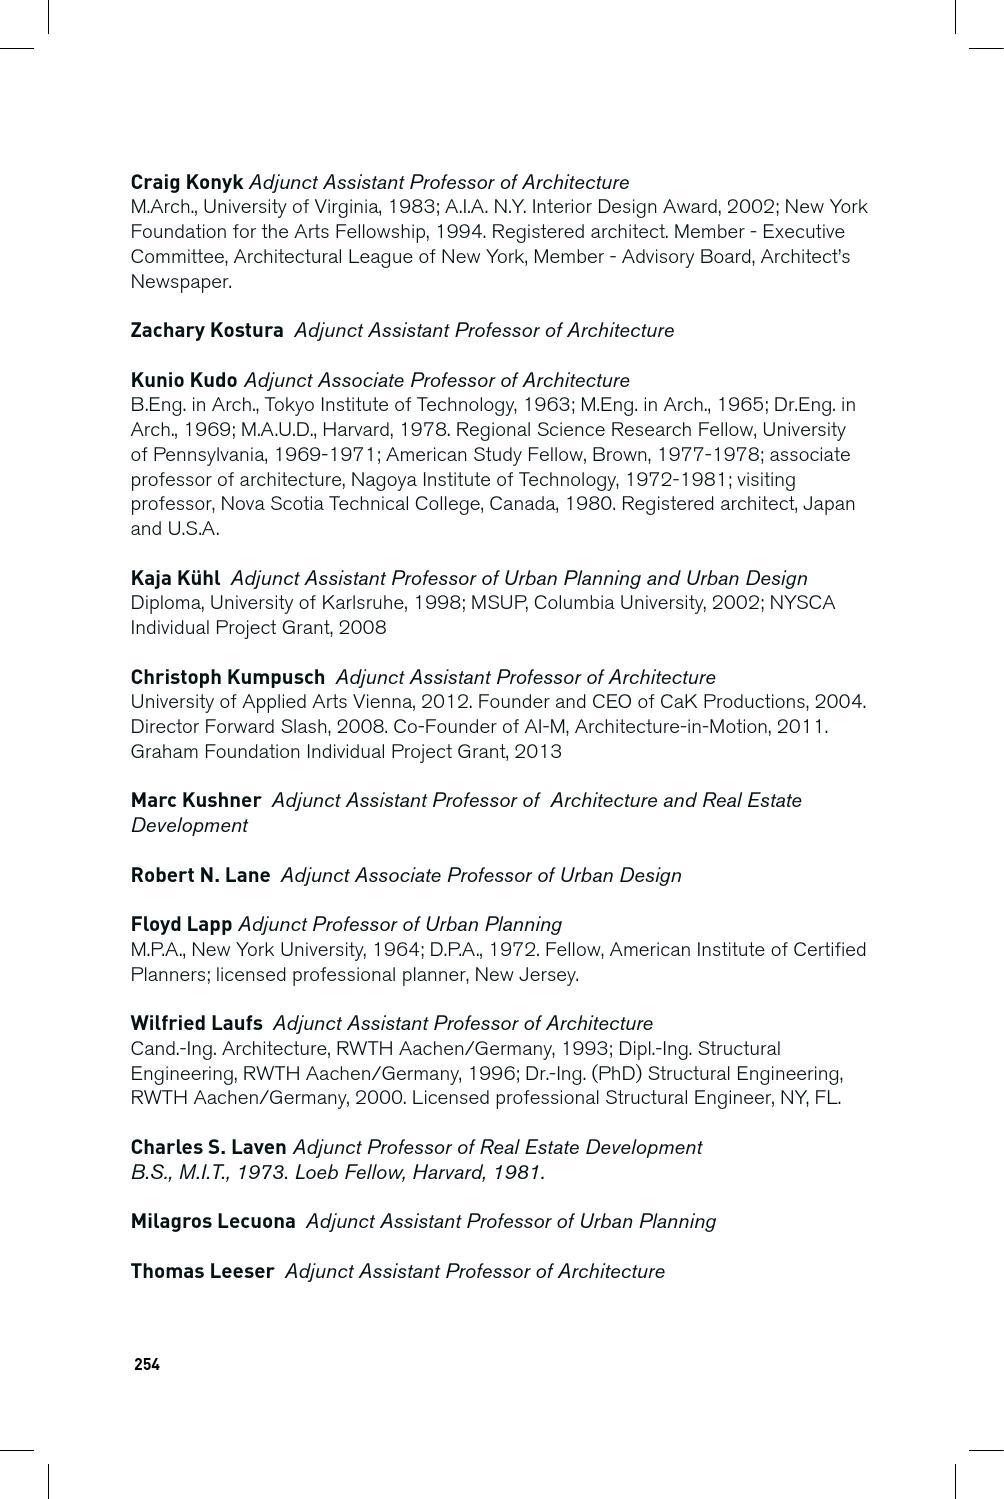 Gsapp bulletin 1415 by gsappdigital publishing issuu 1betcityfo Gallery